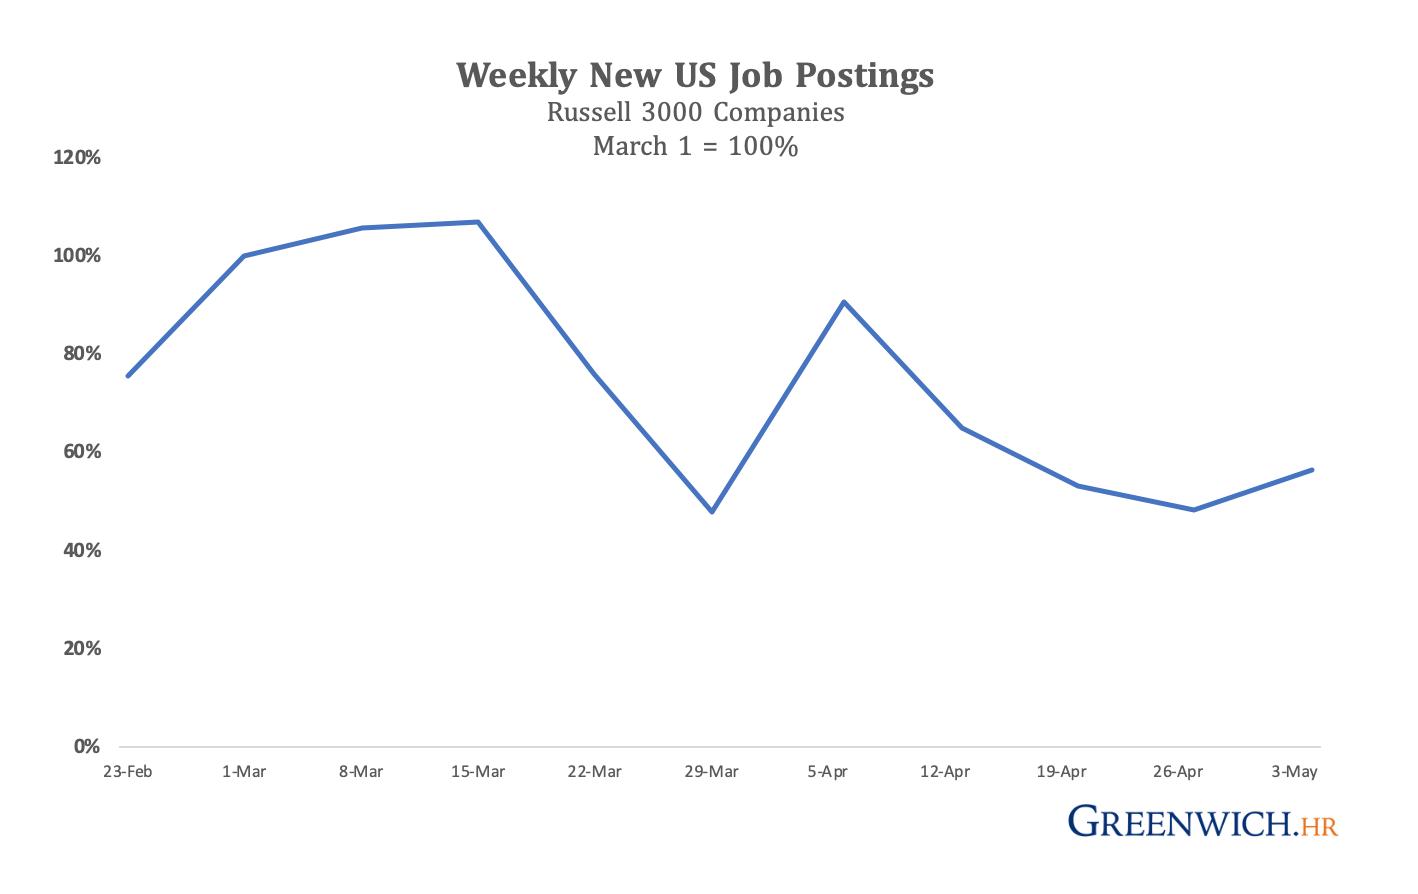 Russell 3000 Job Demand Continues Decline In April